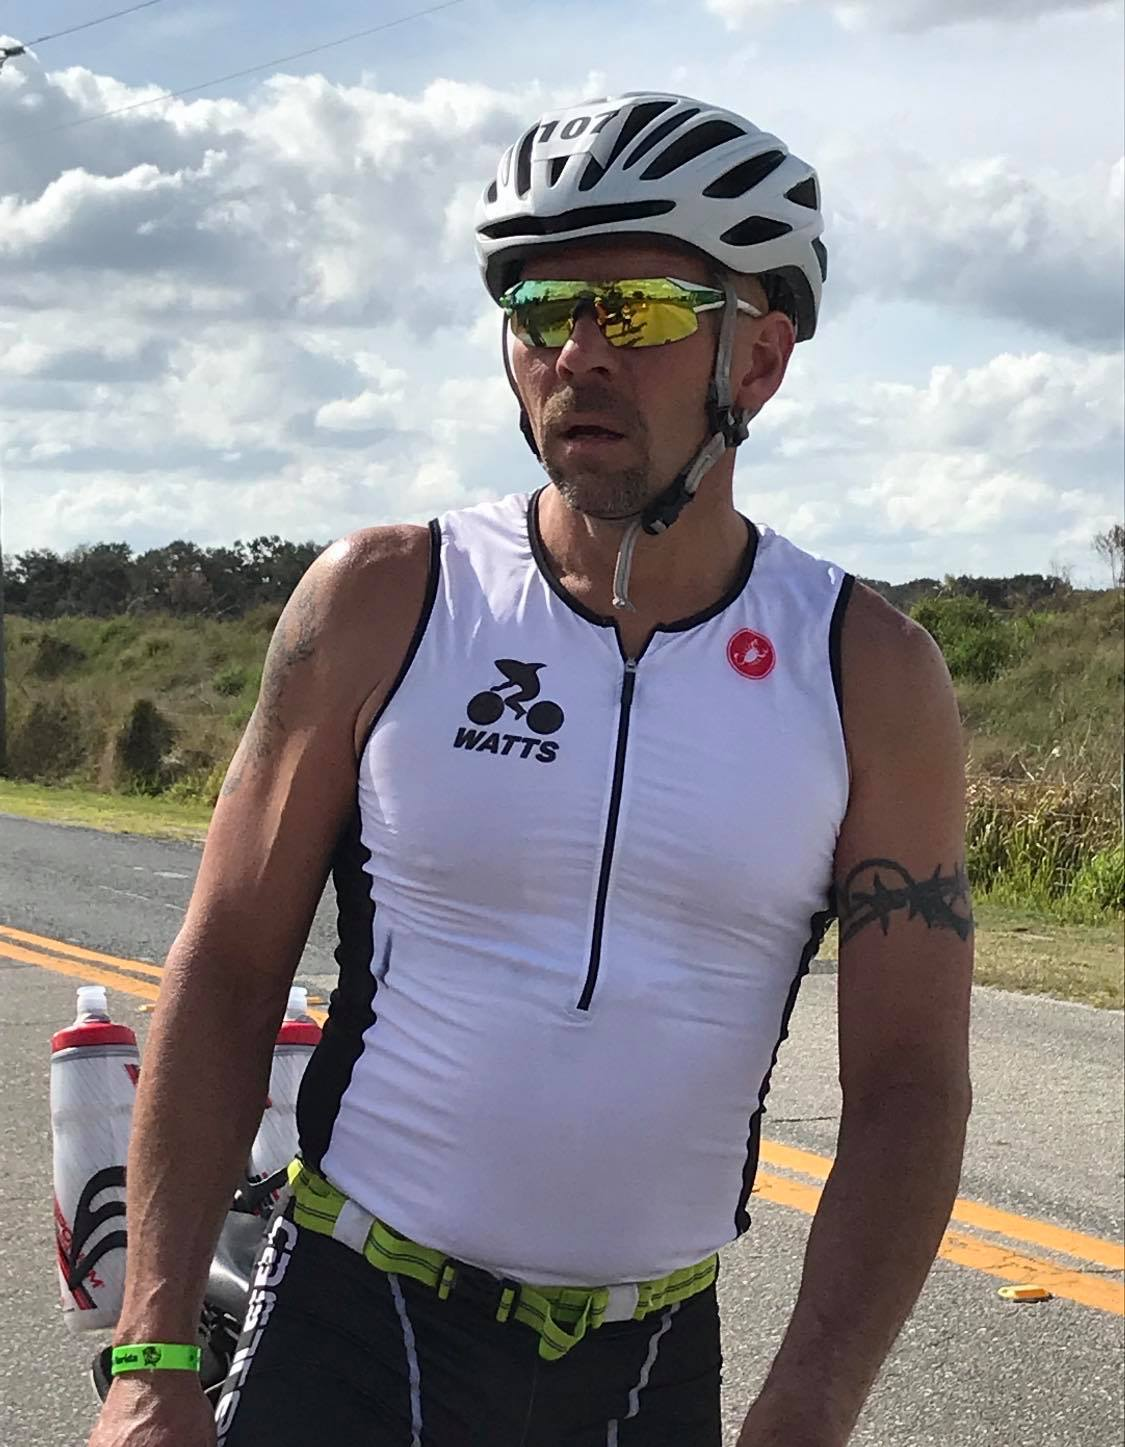 Coach_Terry_Wilson_Pursuit_of_The_Perfect_Race_Ultraman_Florida_Chris_Pollack_Bike.jpg